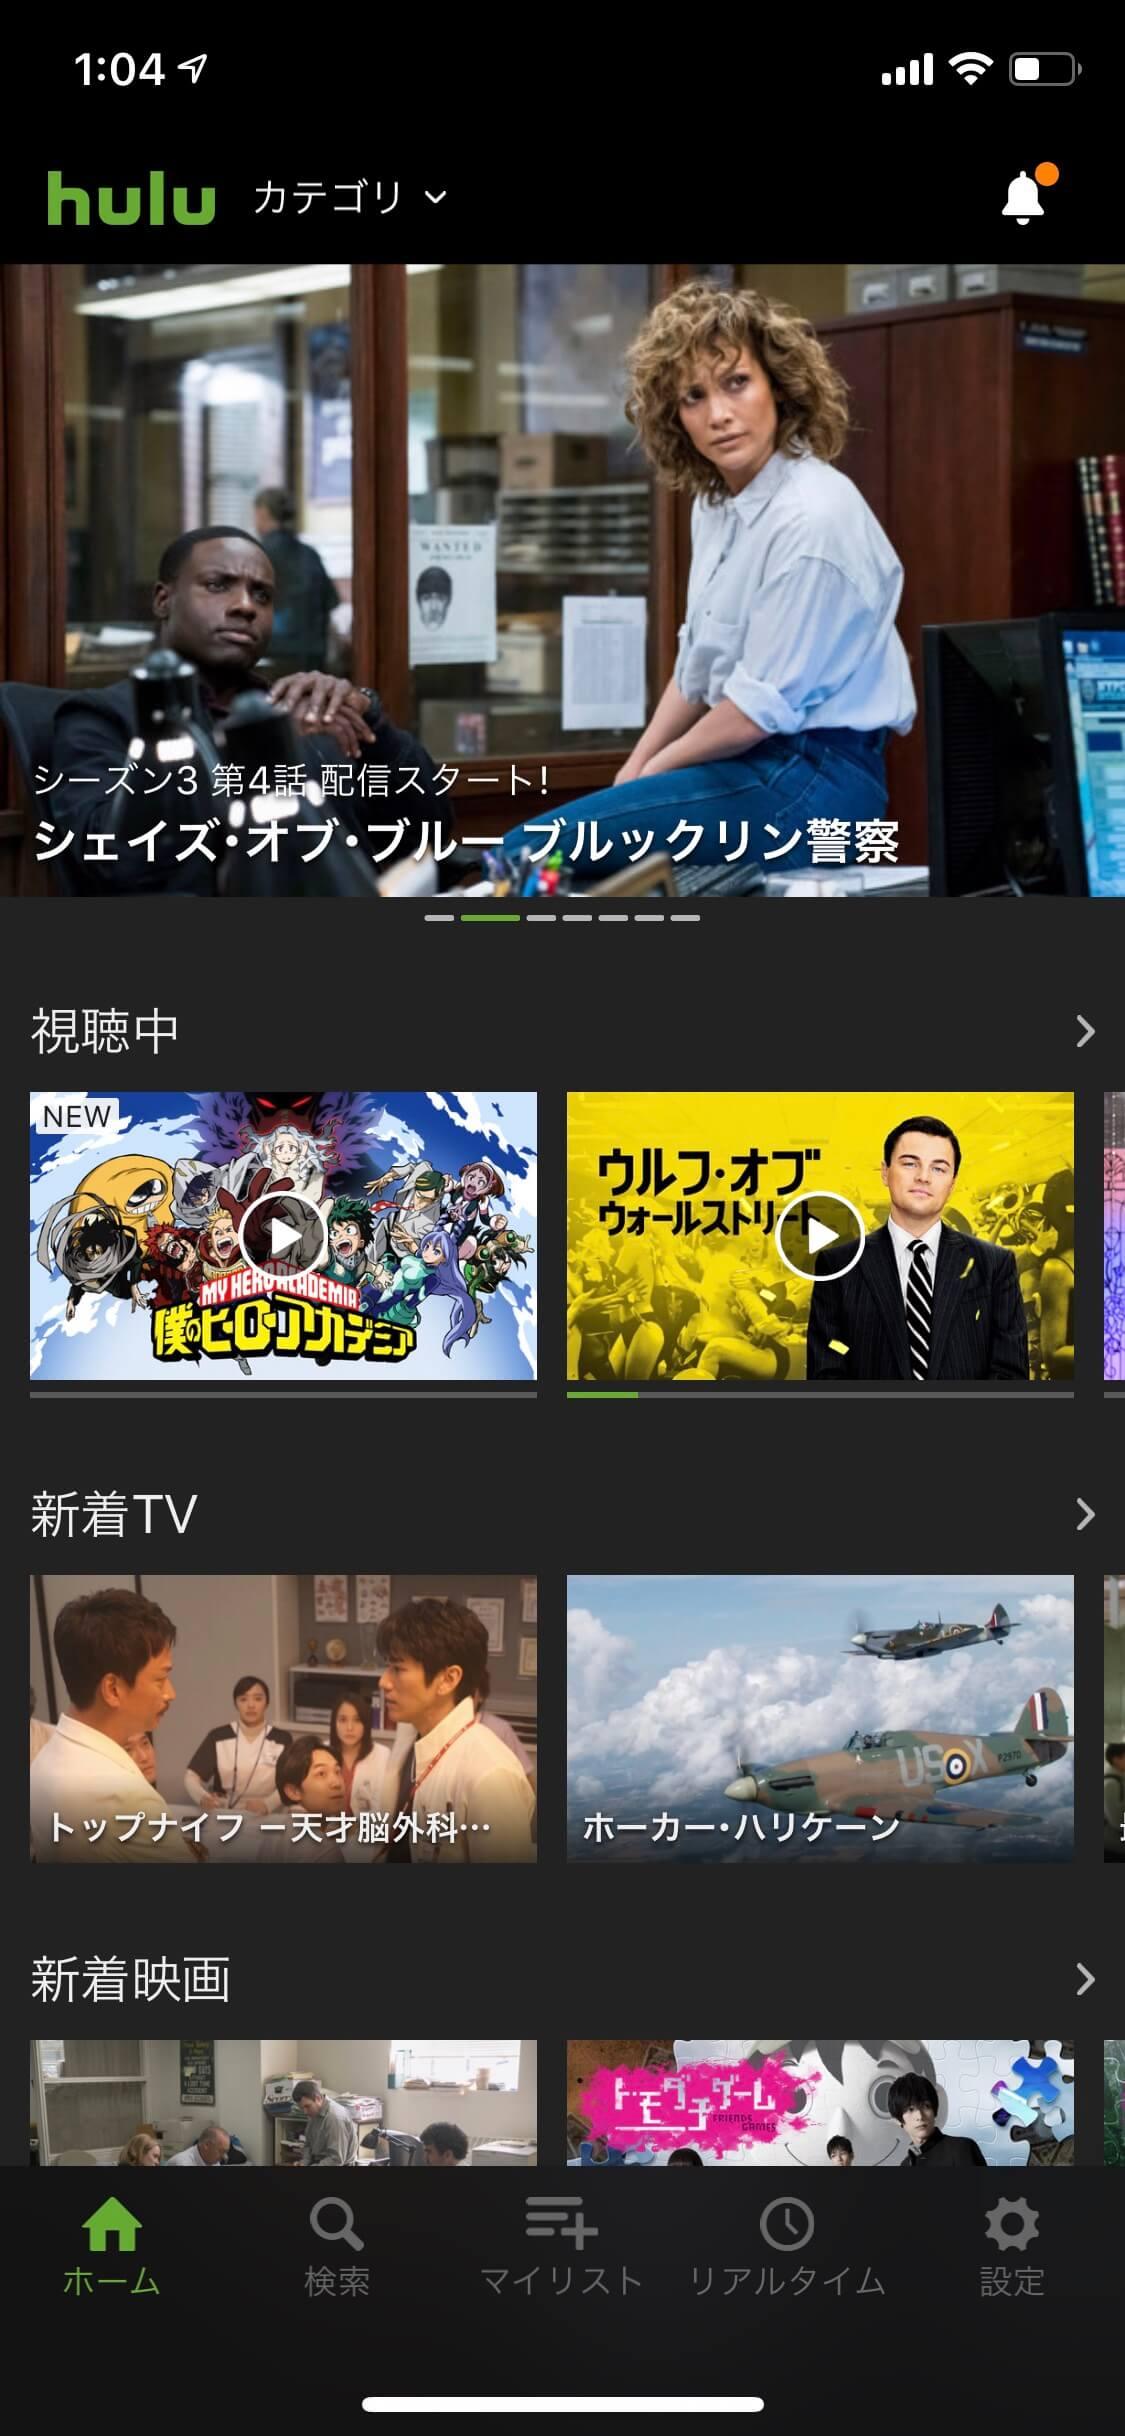 HuluのスマホアプリTOP